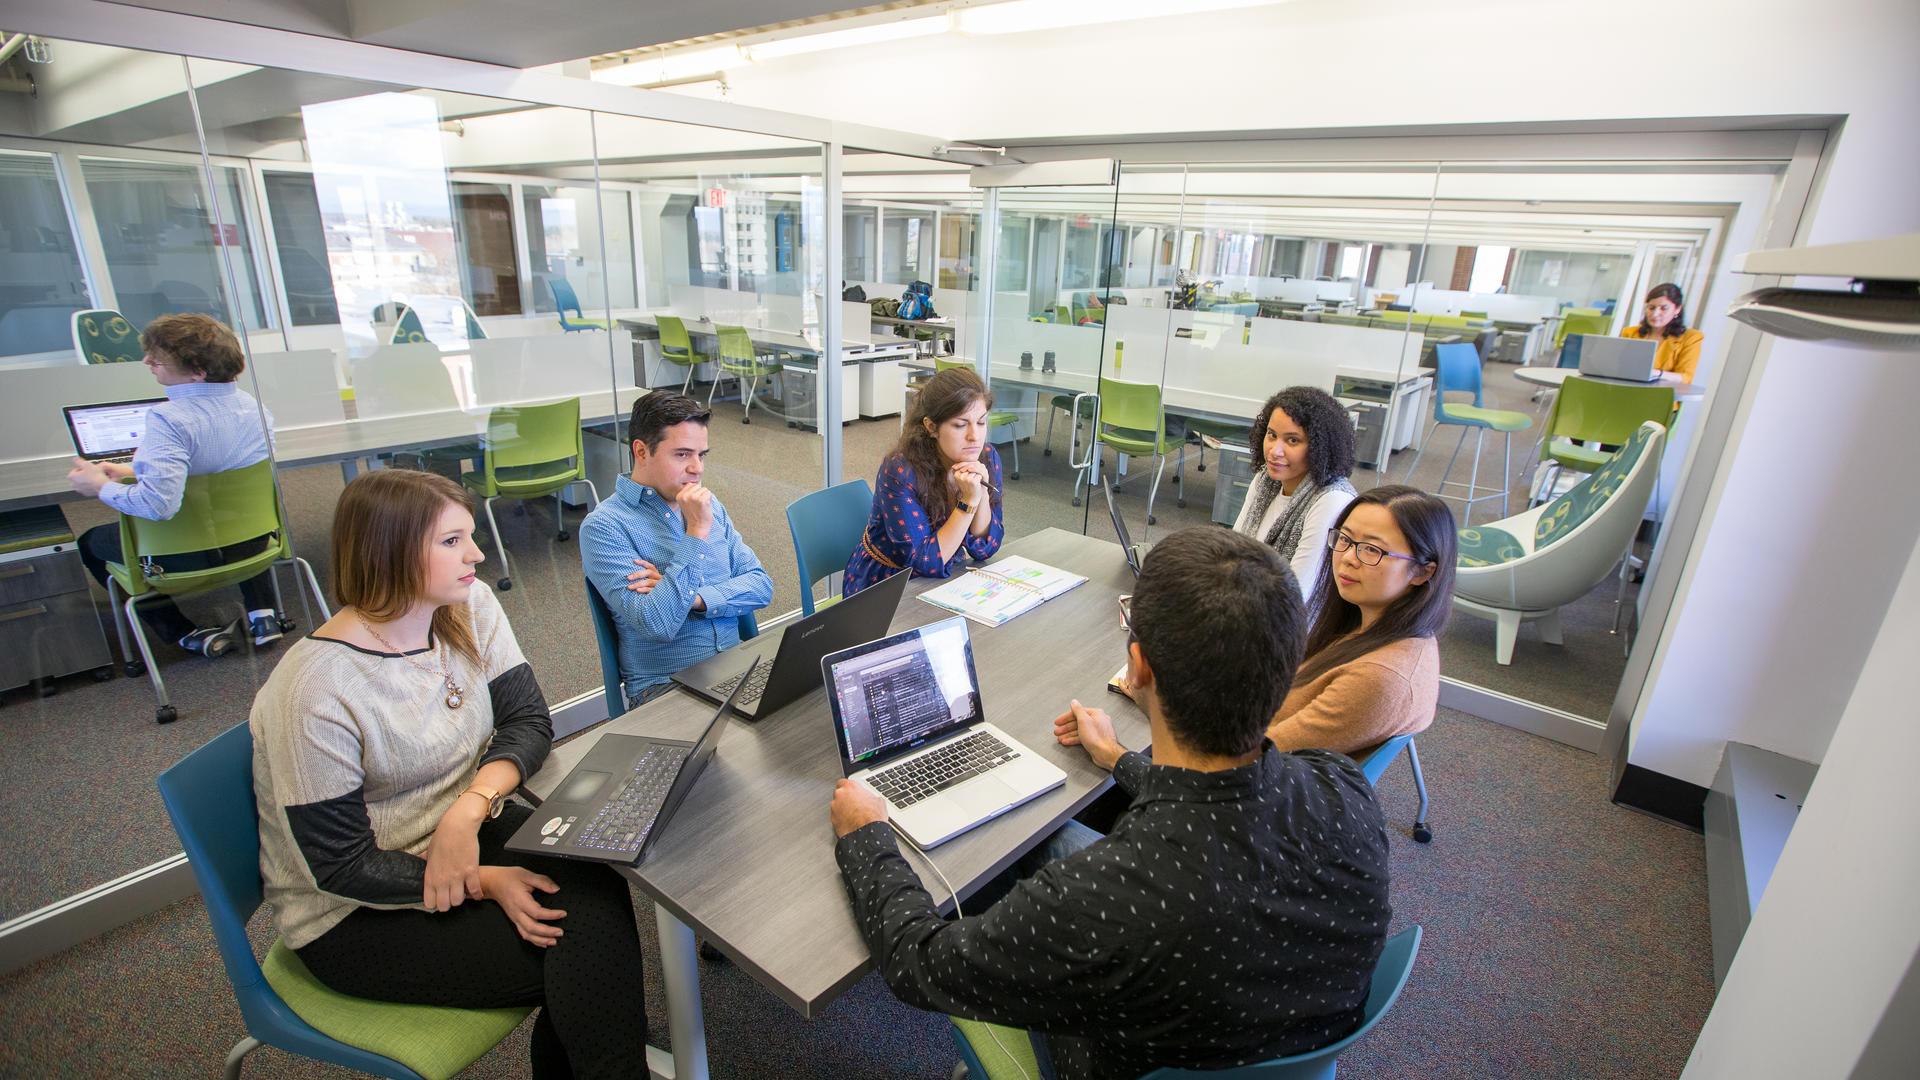 Graduate Commons, University of Massachusetts Amherst